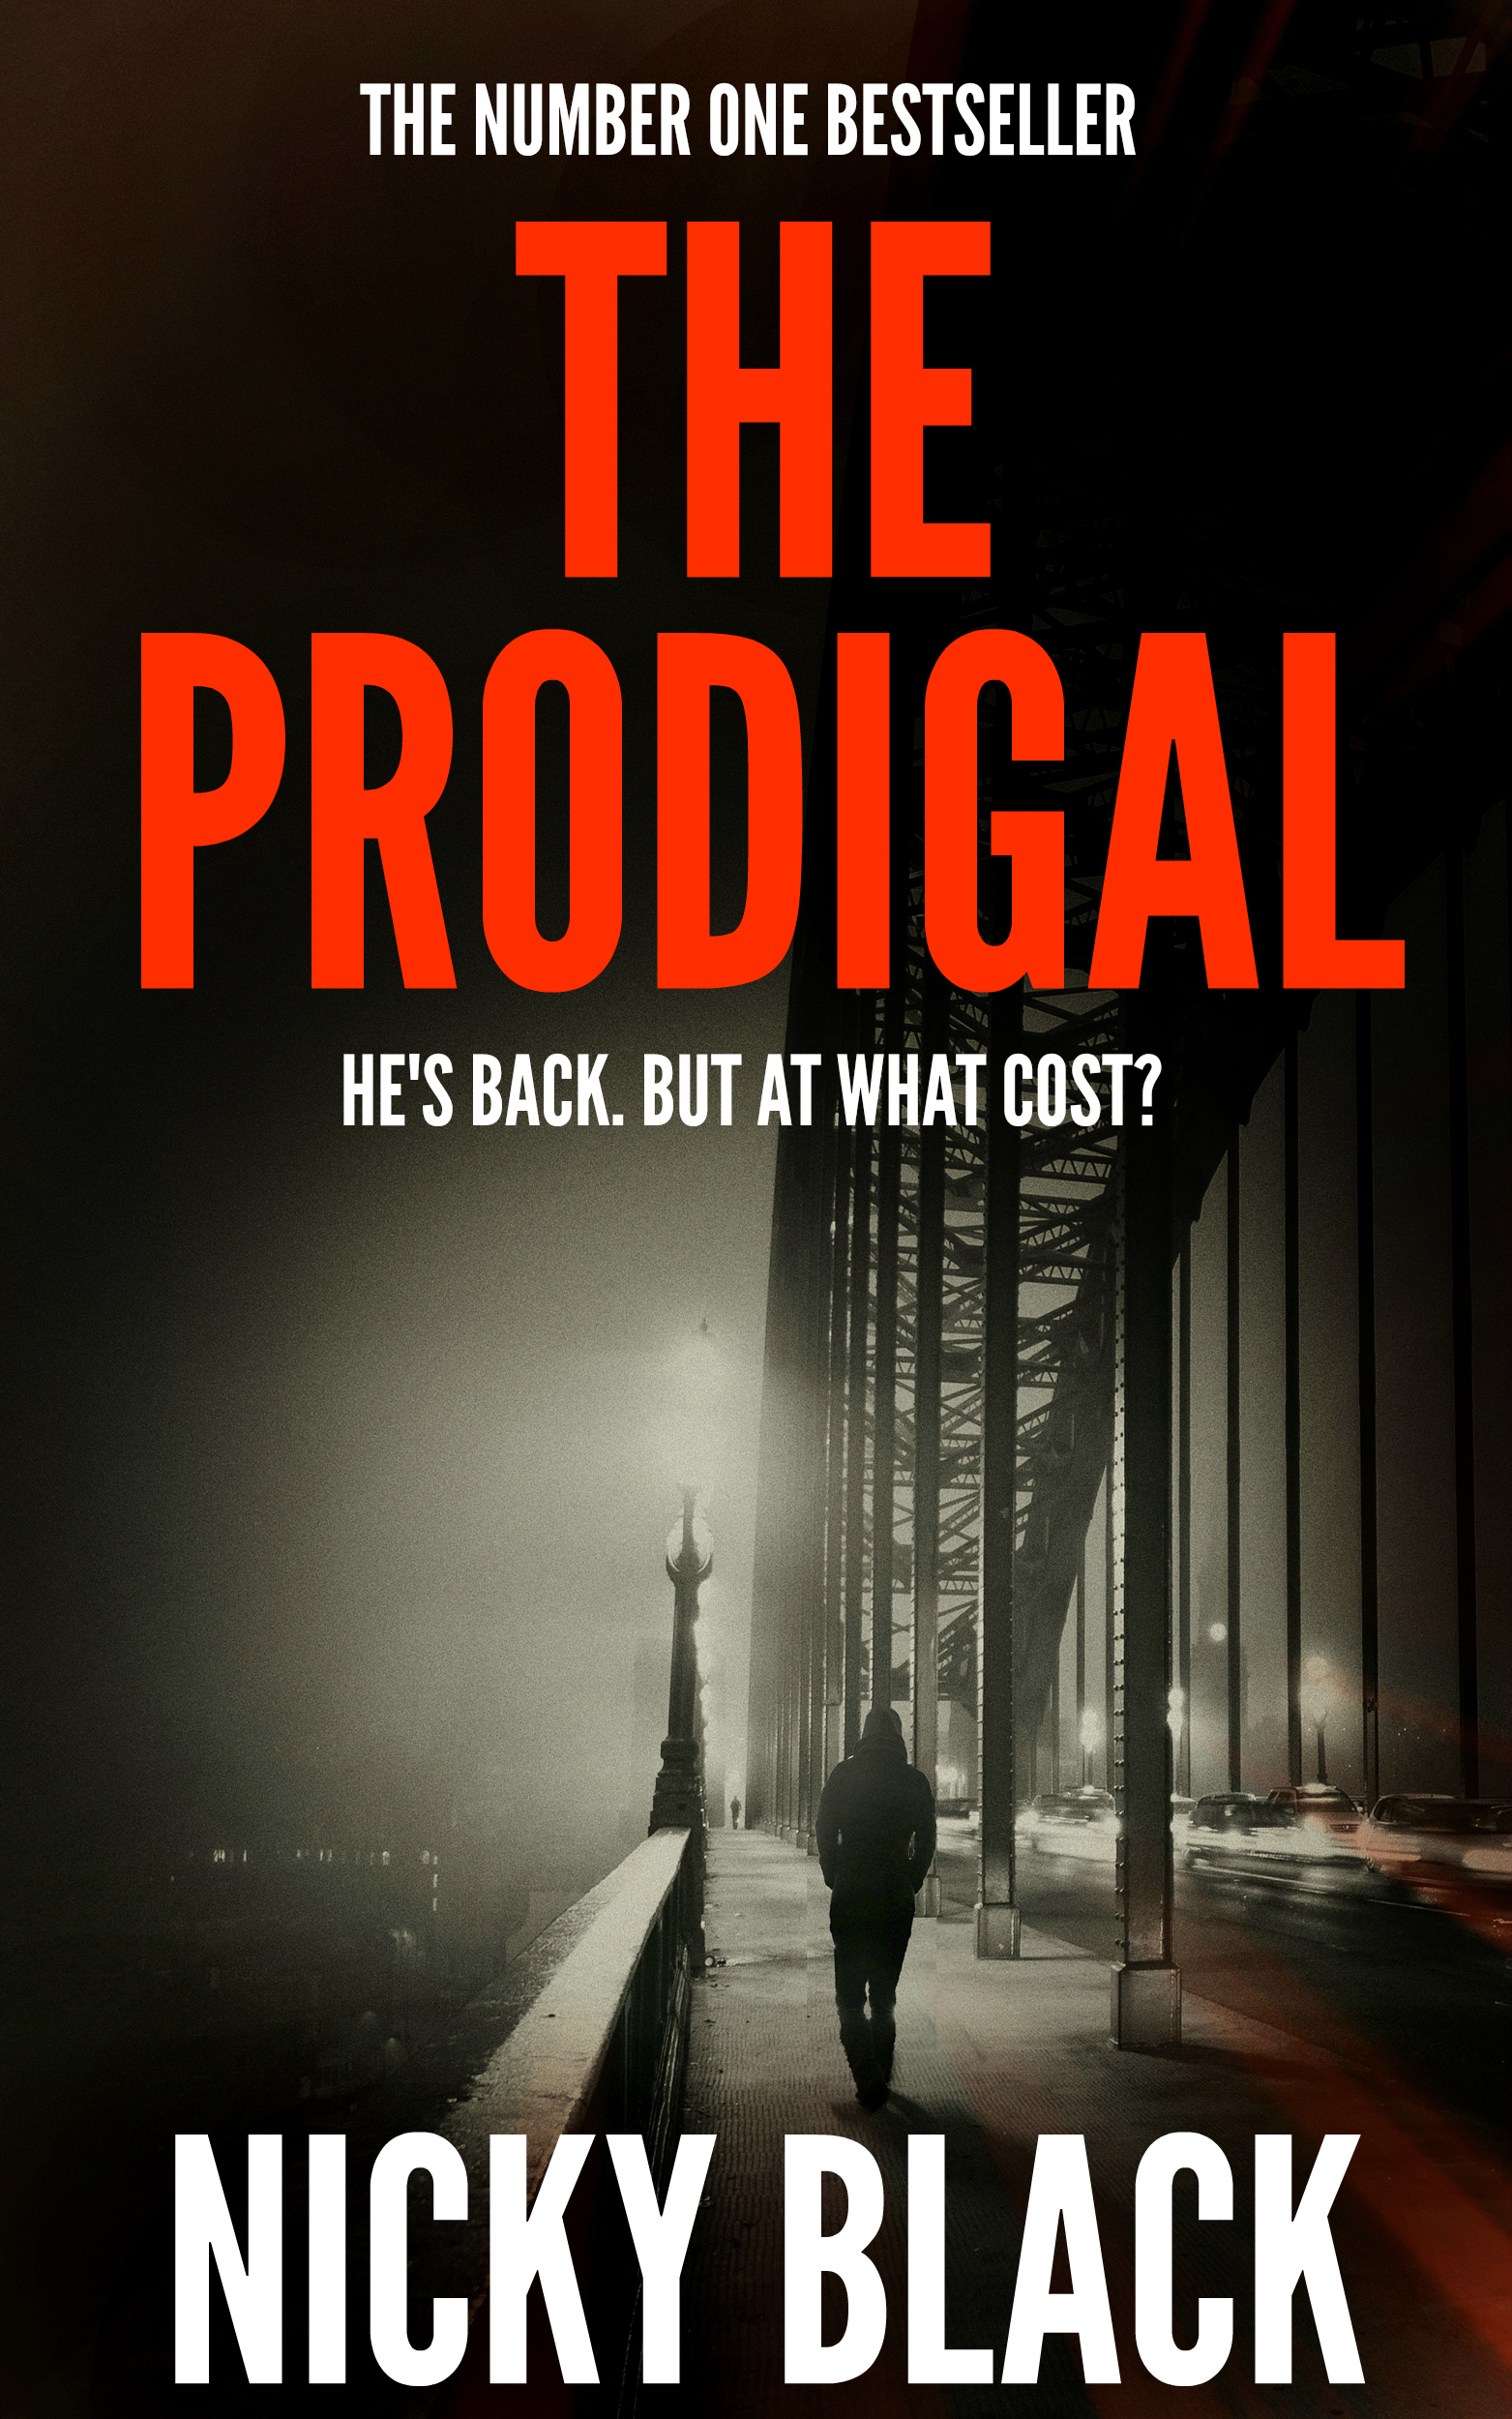 The Prodigal 4.12.2016 (2).jpg